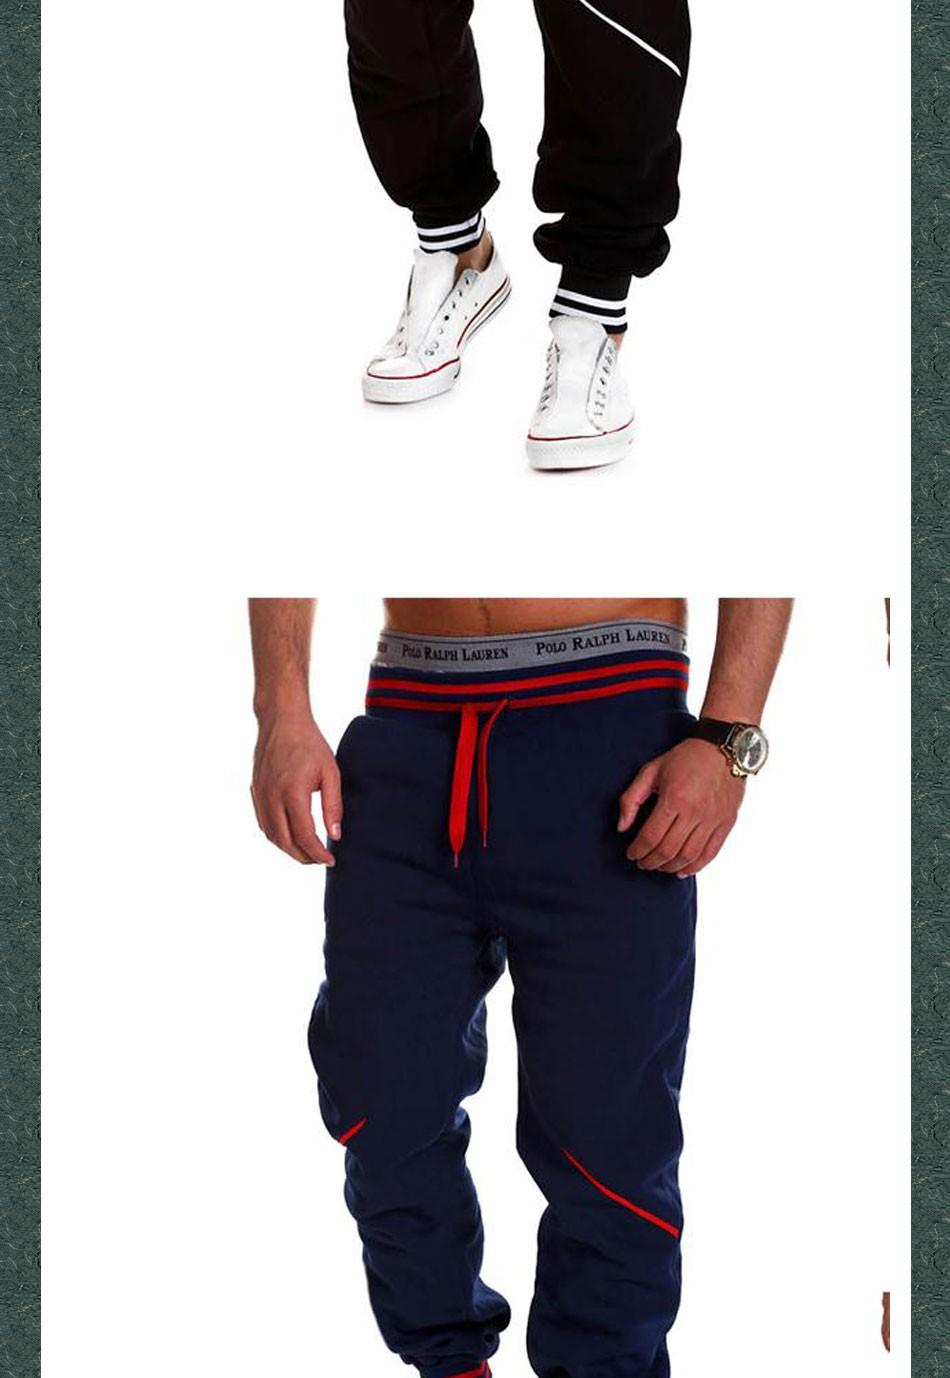 28aca92d4ff5 HOT 2018 Fashion Spring autumn Stretch Hip Hop Joggers clothing Traning Pants  Men Track Pants Baggy Mens Sweatpants 4color